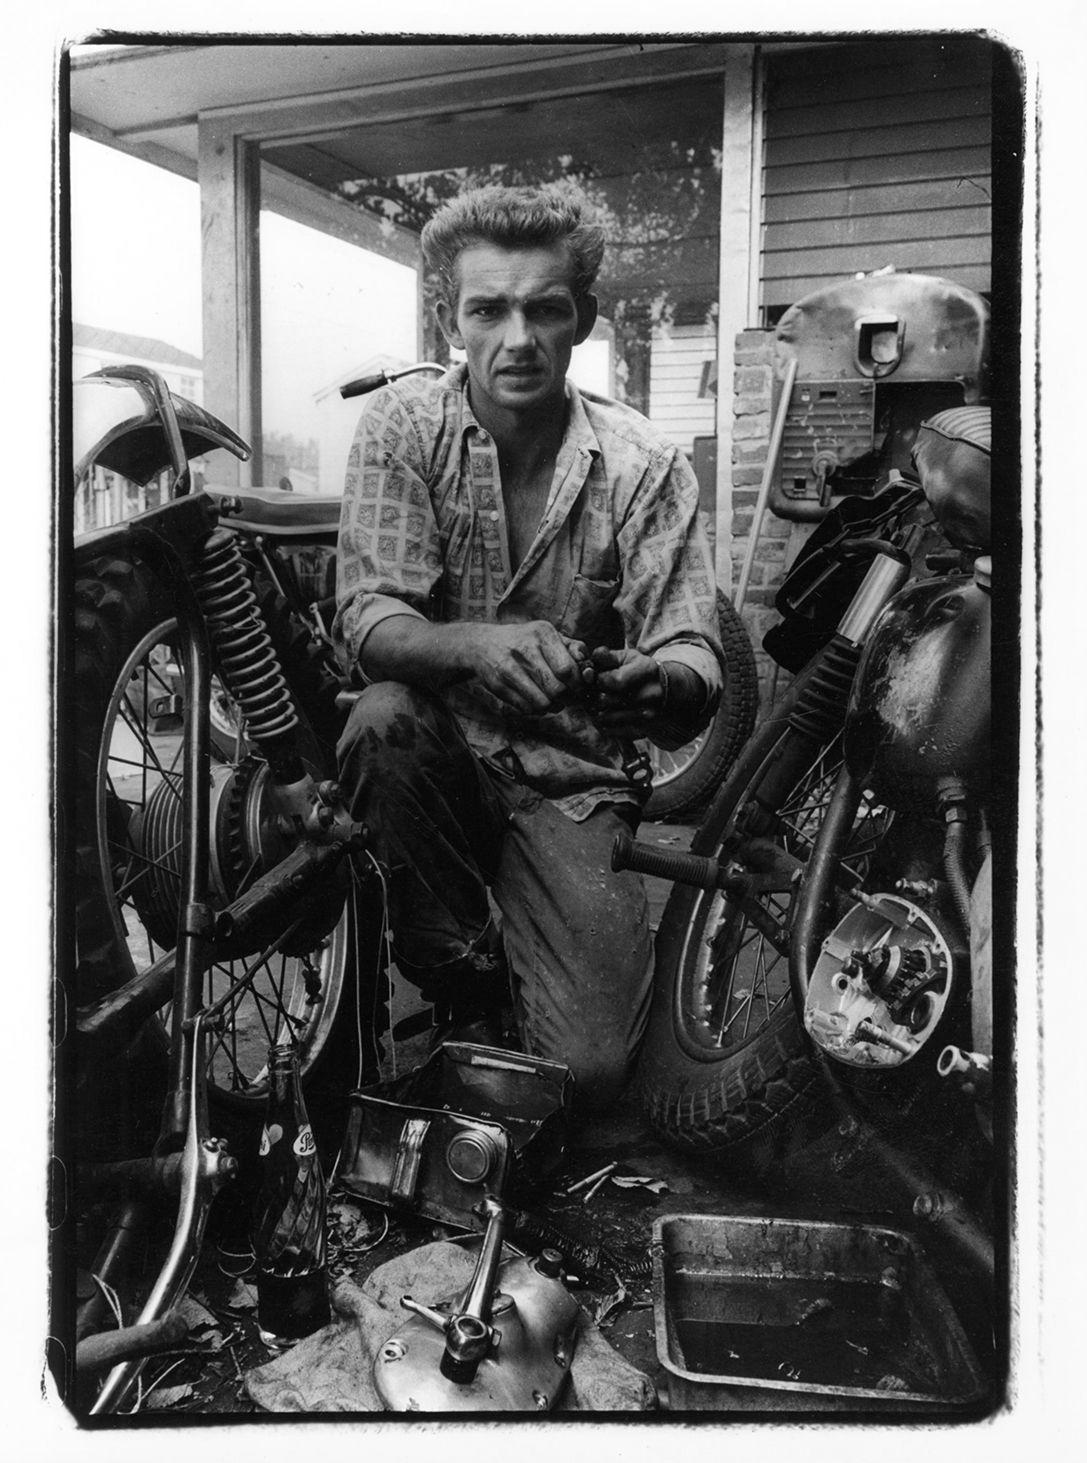 Copyright Danny Lyon / Magnum Photos, Broken Gear Box, New Orleans, from The Bikeriders, 1964